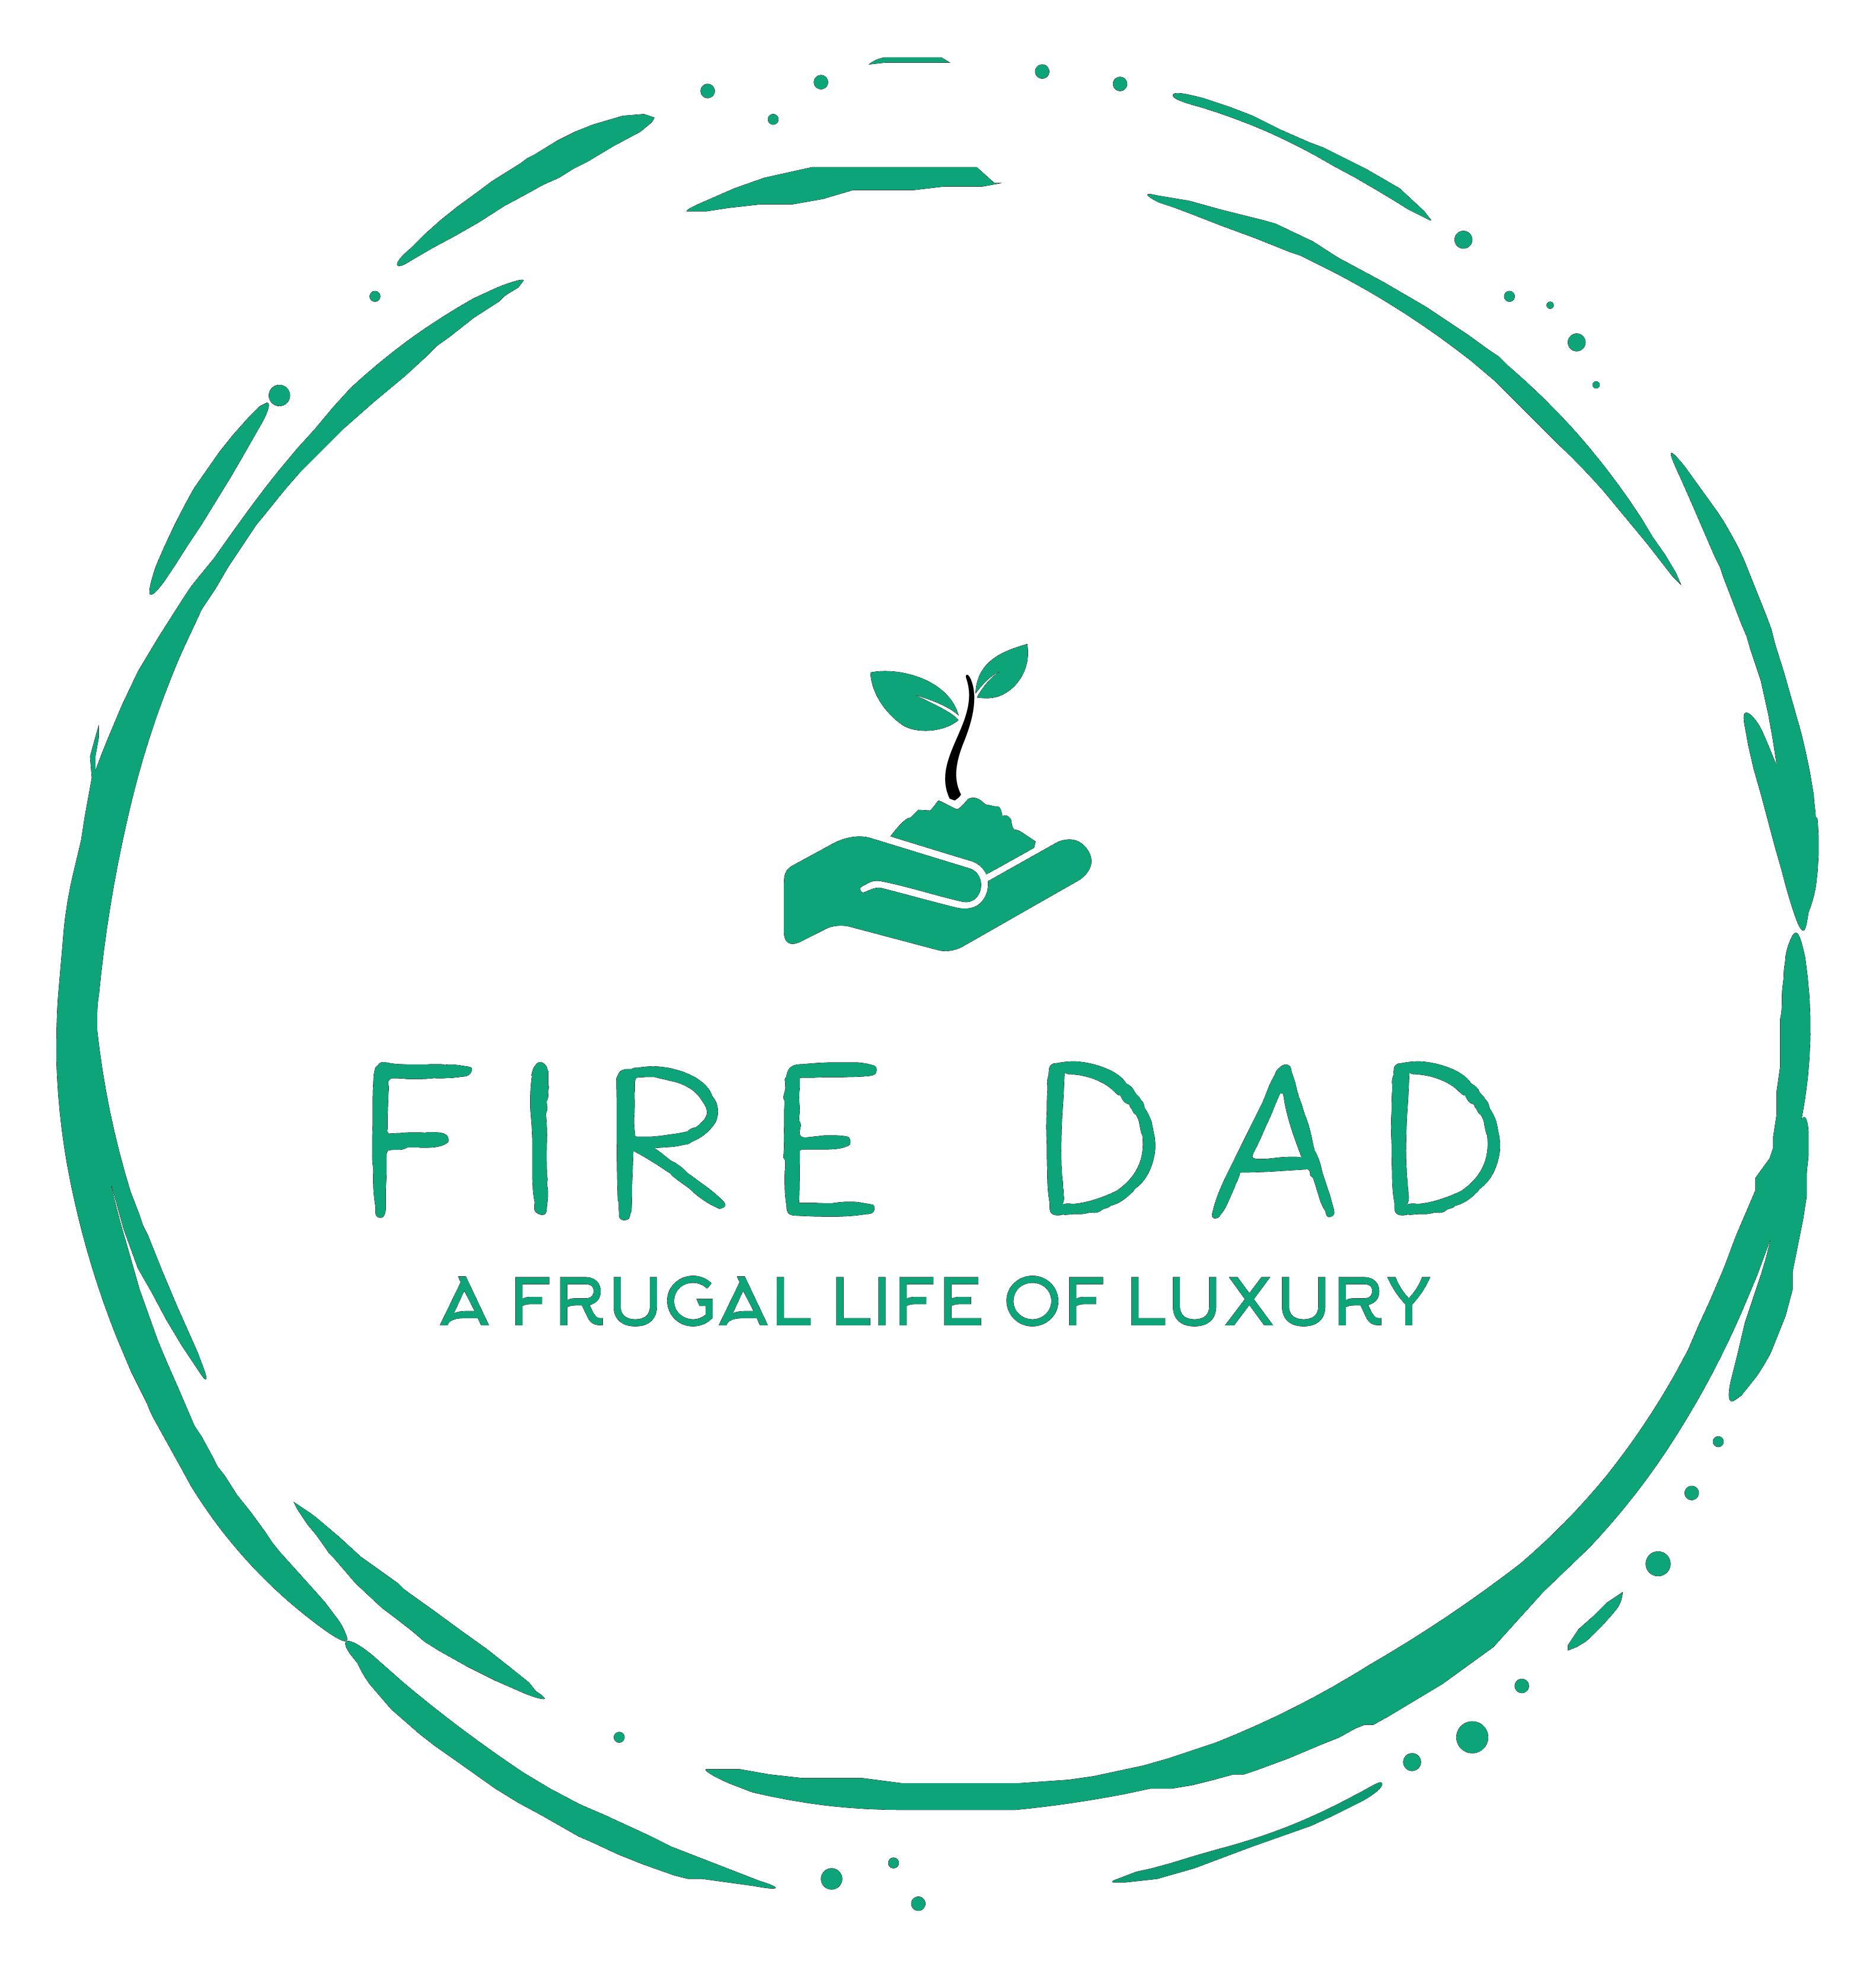 Fire Dad